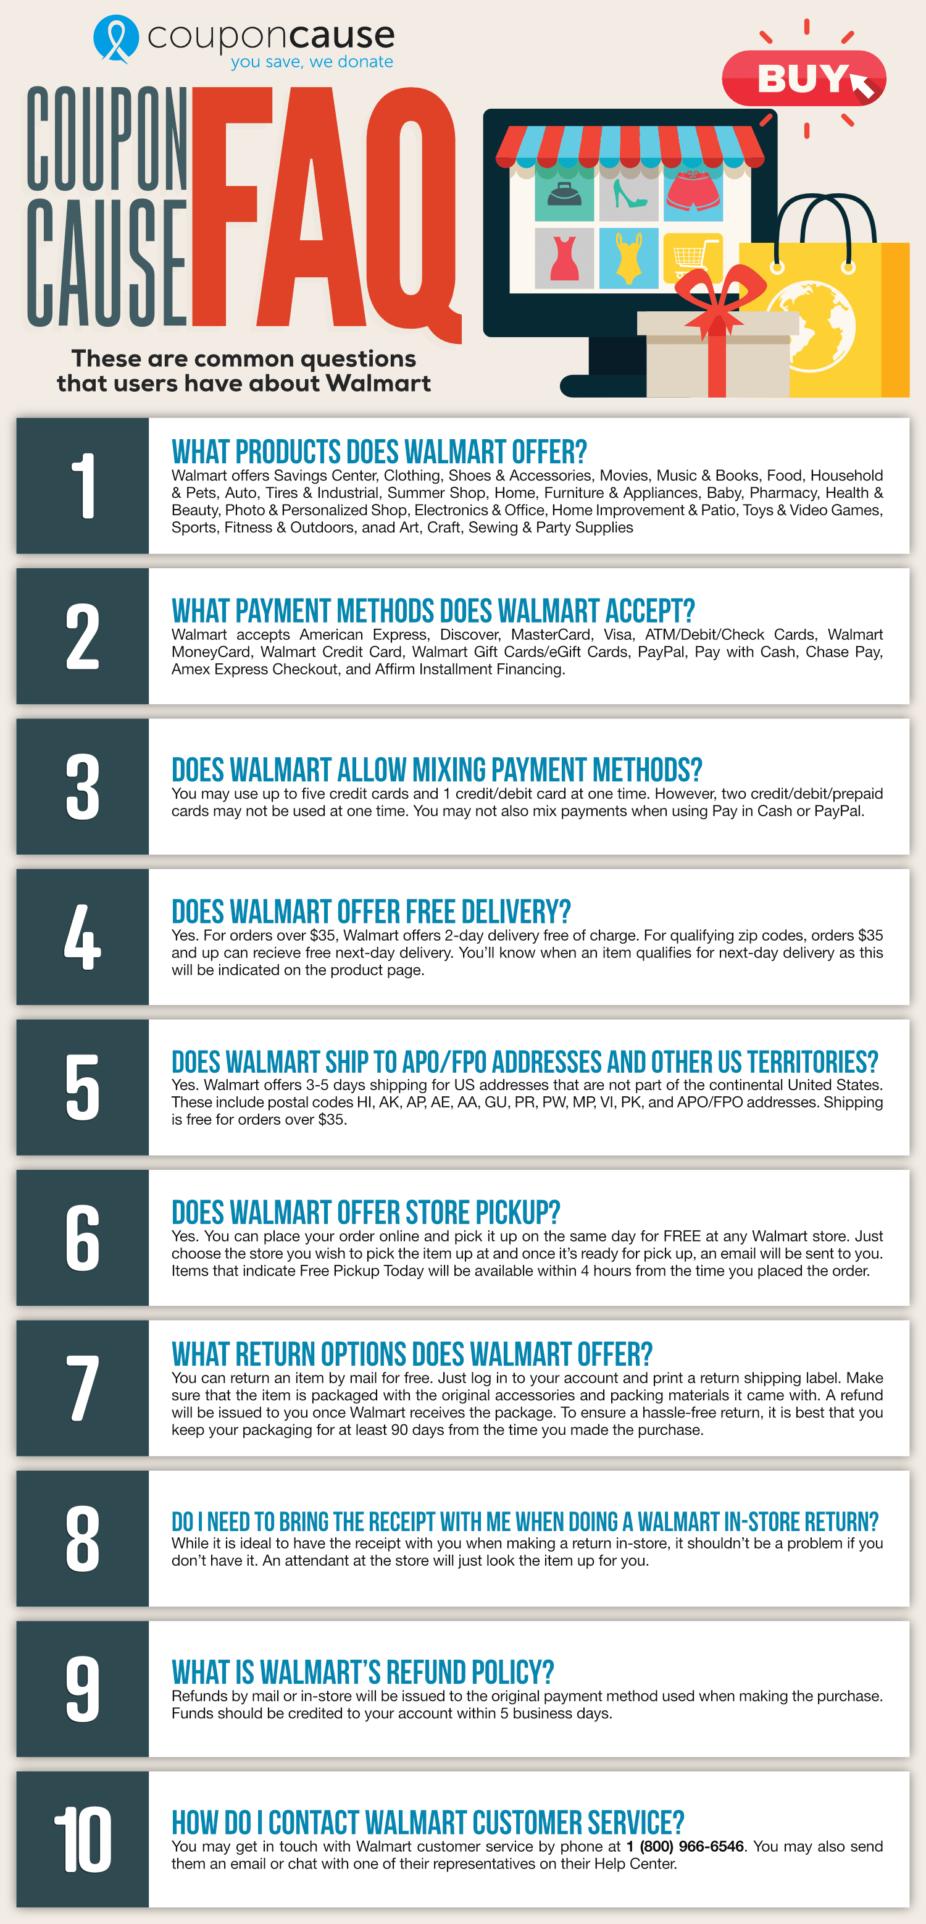 Walmart Infographic Order Coupon Cause FAQ (C.C. FAQ Bad